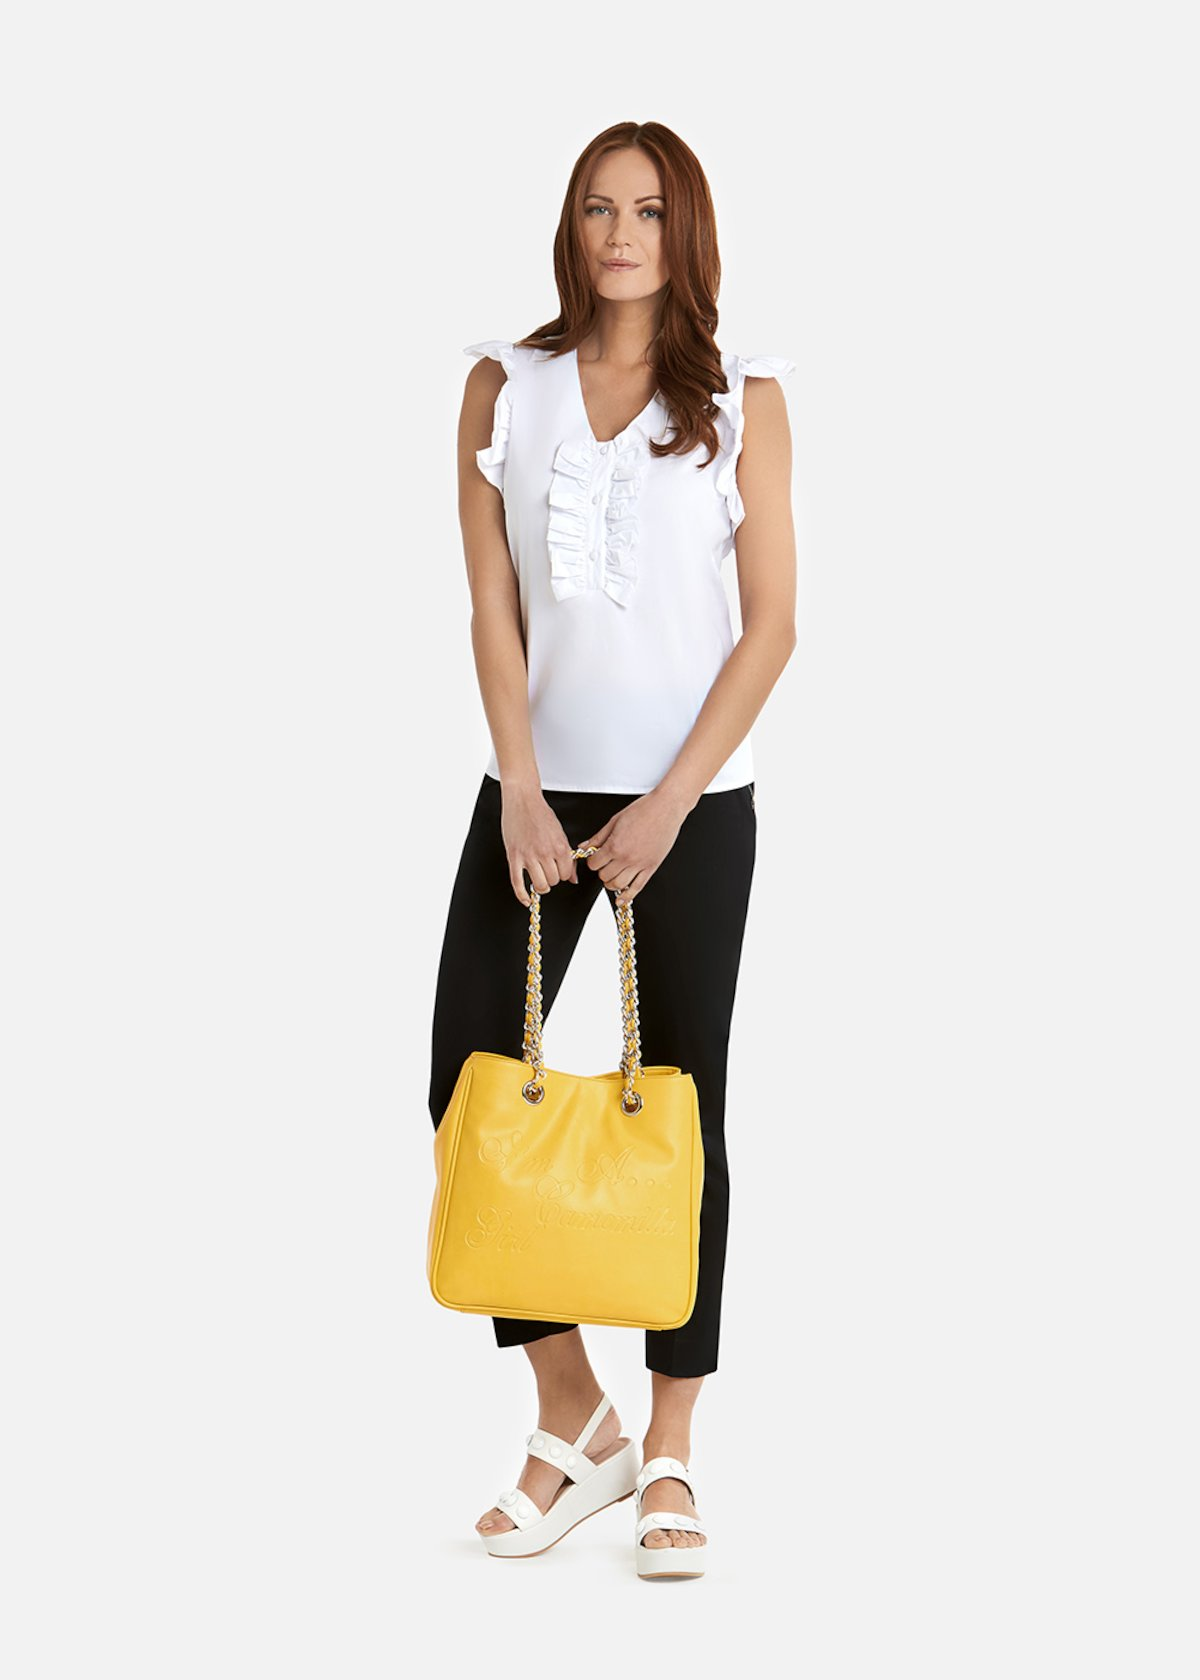 Candie poplin shirt with ruffles - White